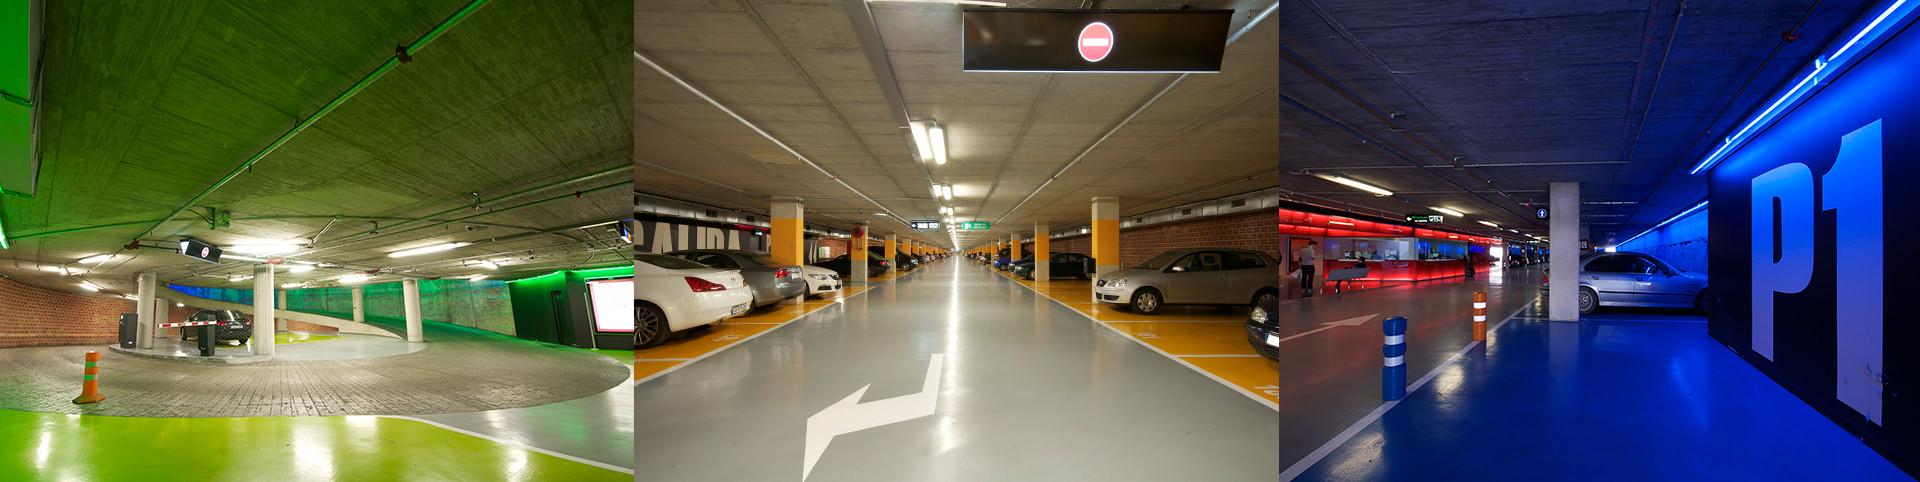 pavimento parking en avenida libertad - tudepa